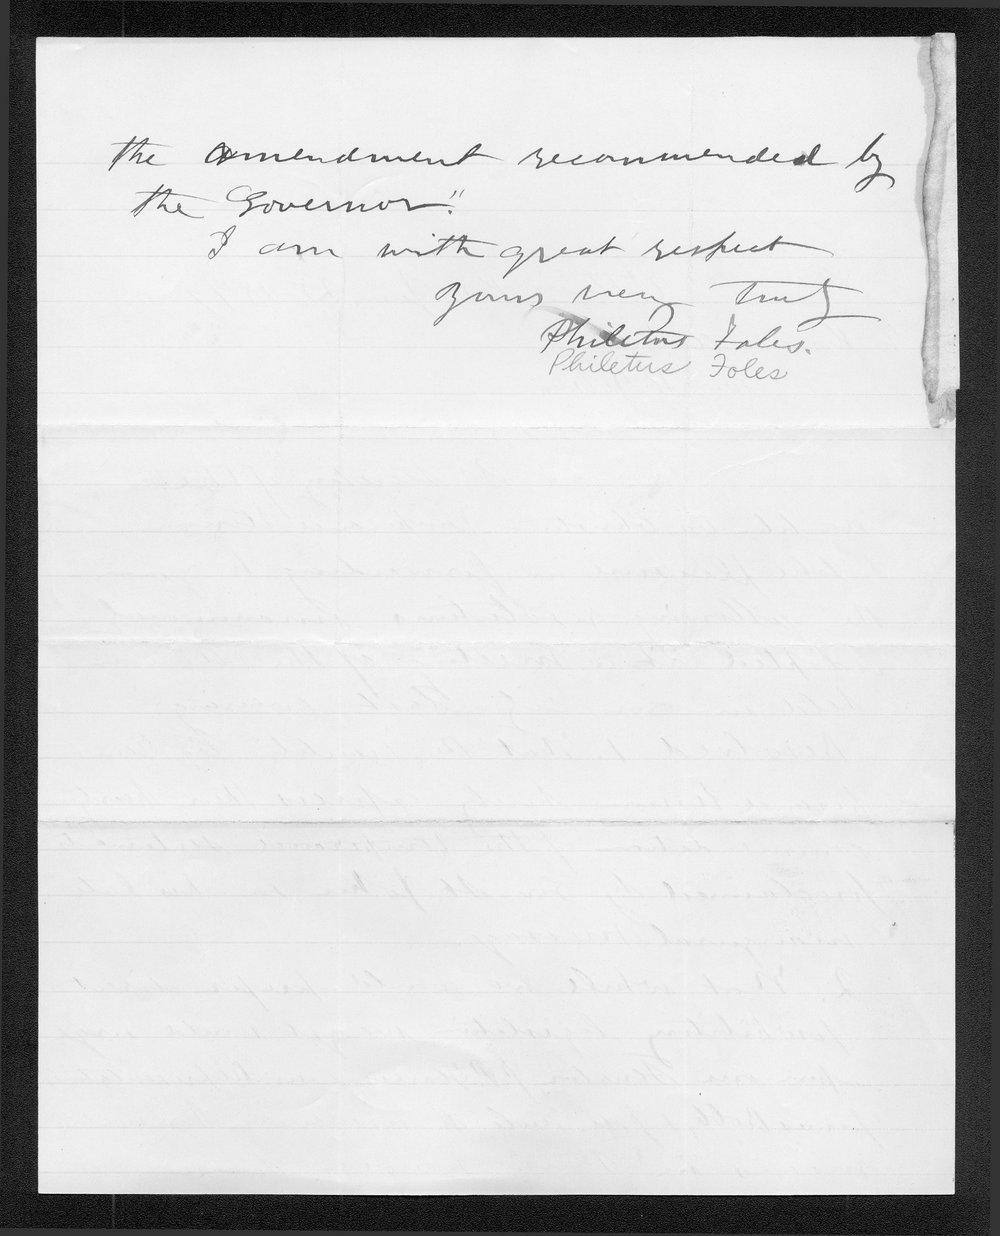 Philetus Foles to Governor John St. John - 2